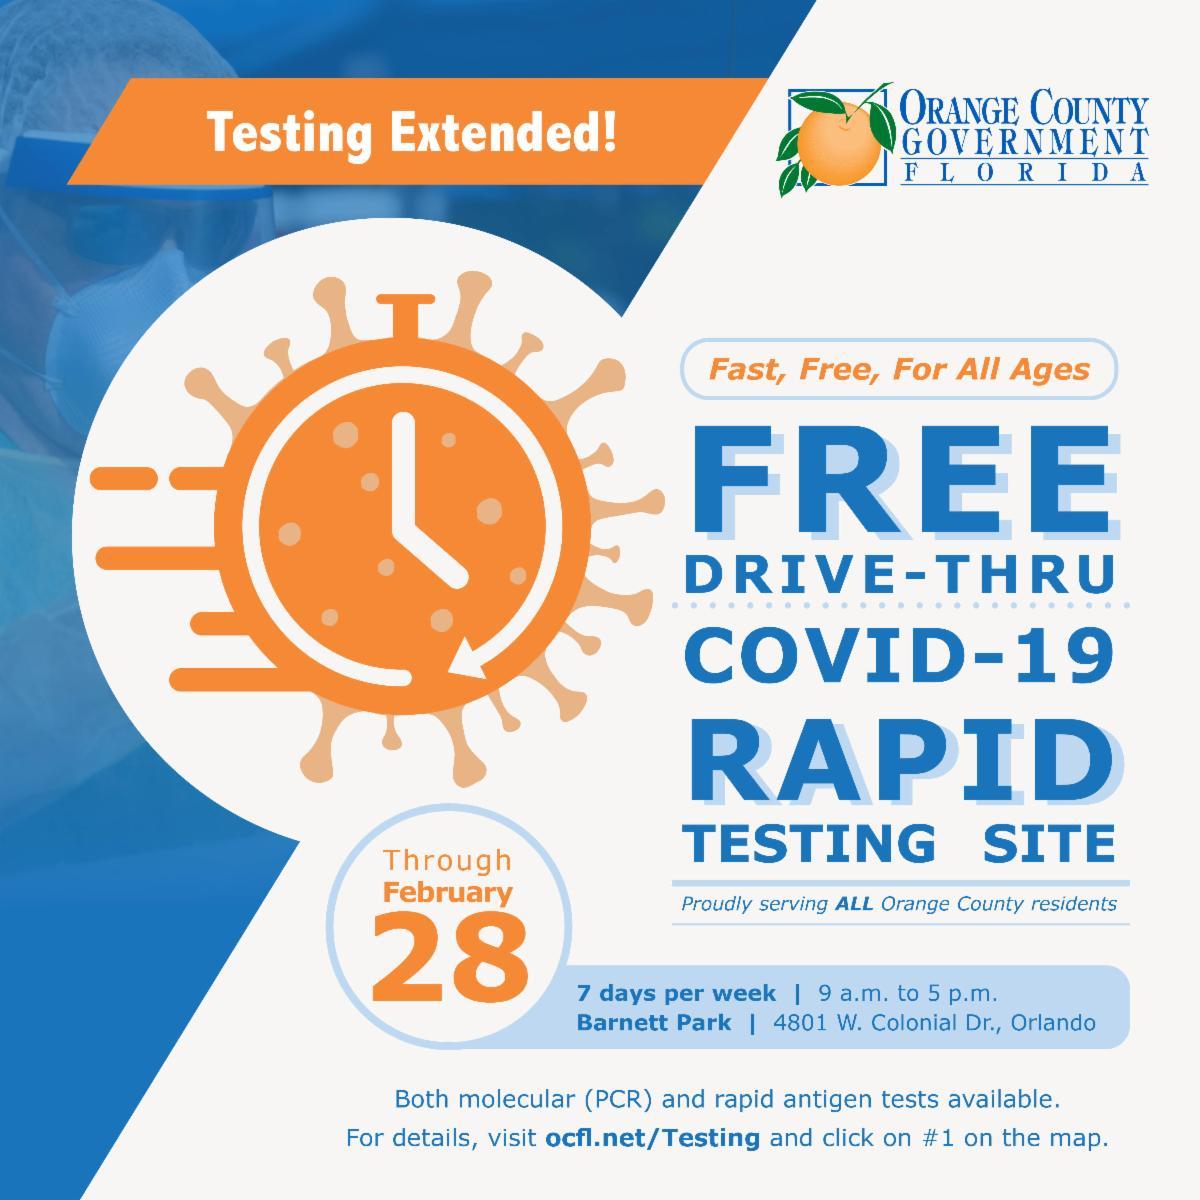 Free Rapid Testing through February 28